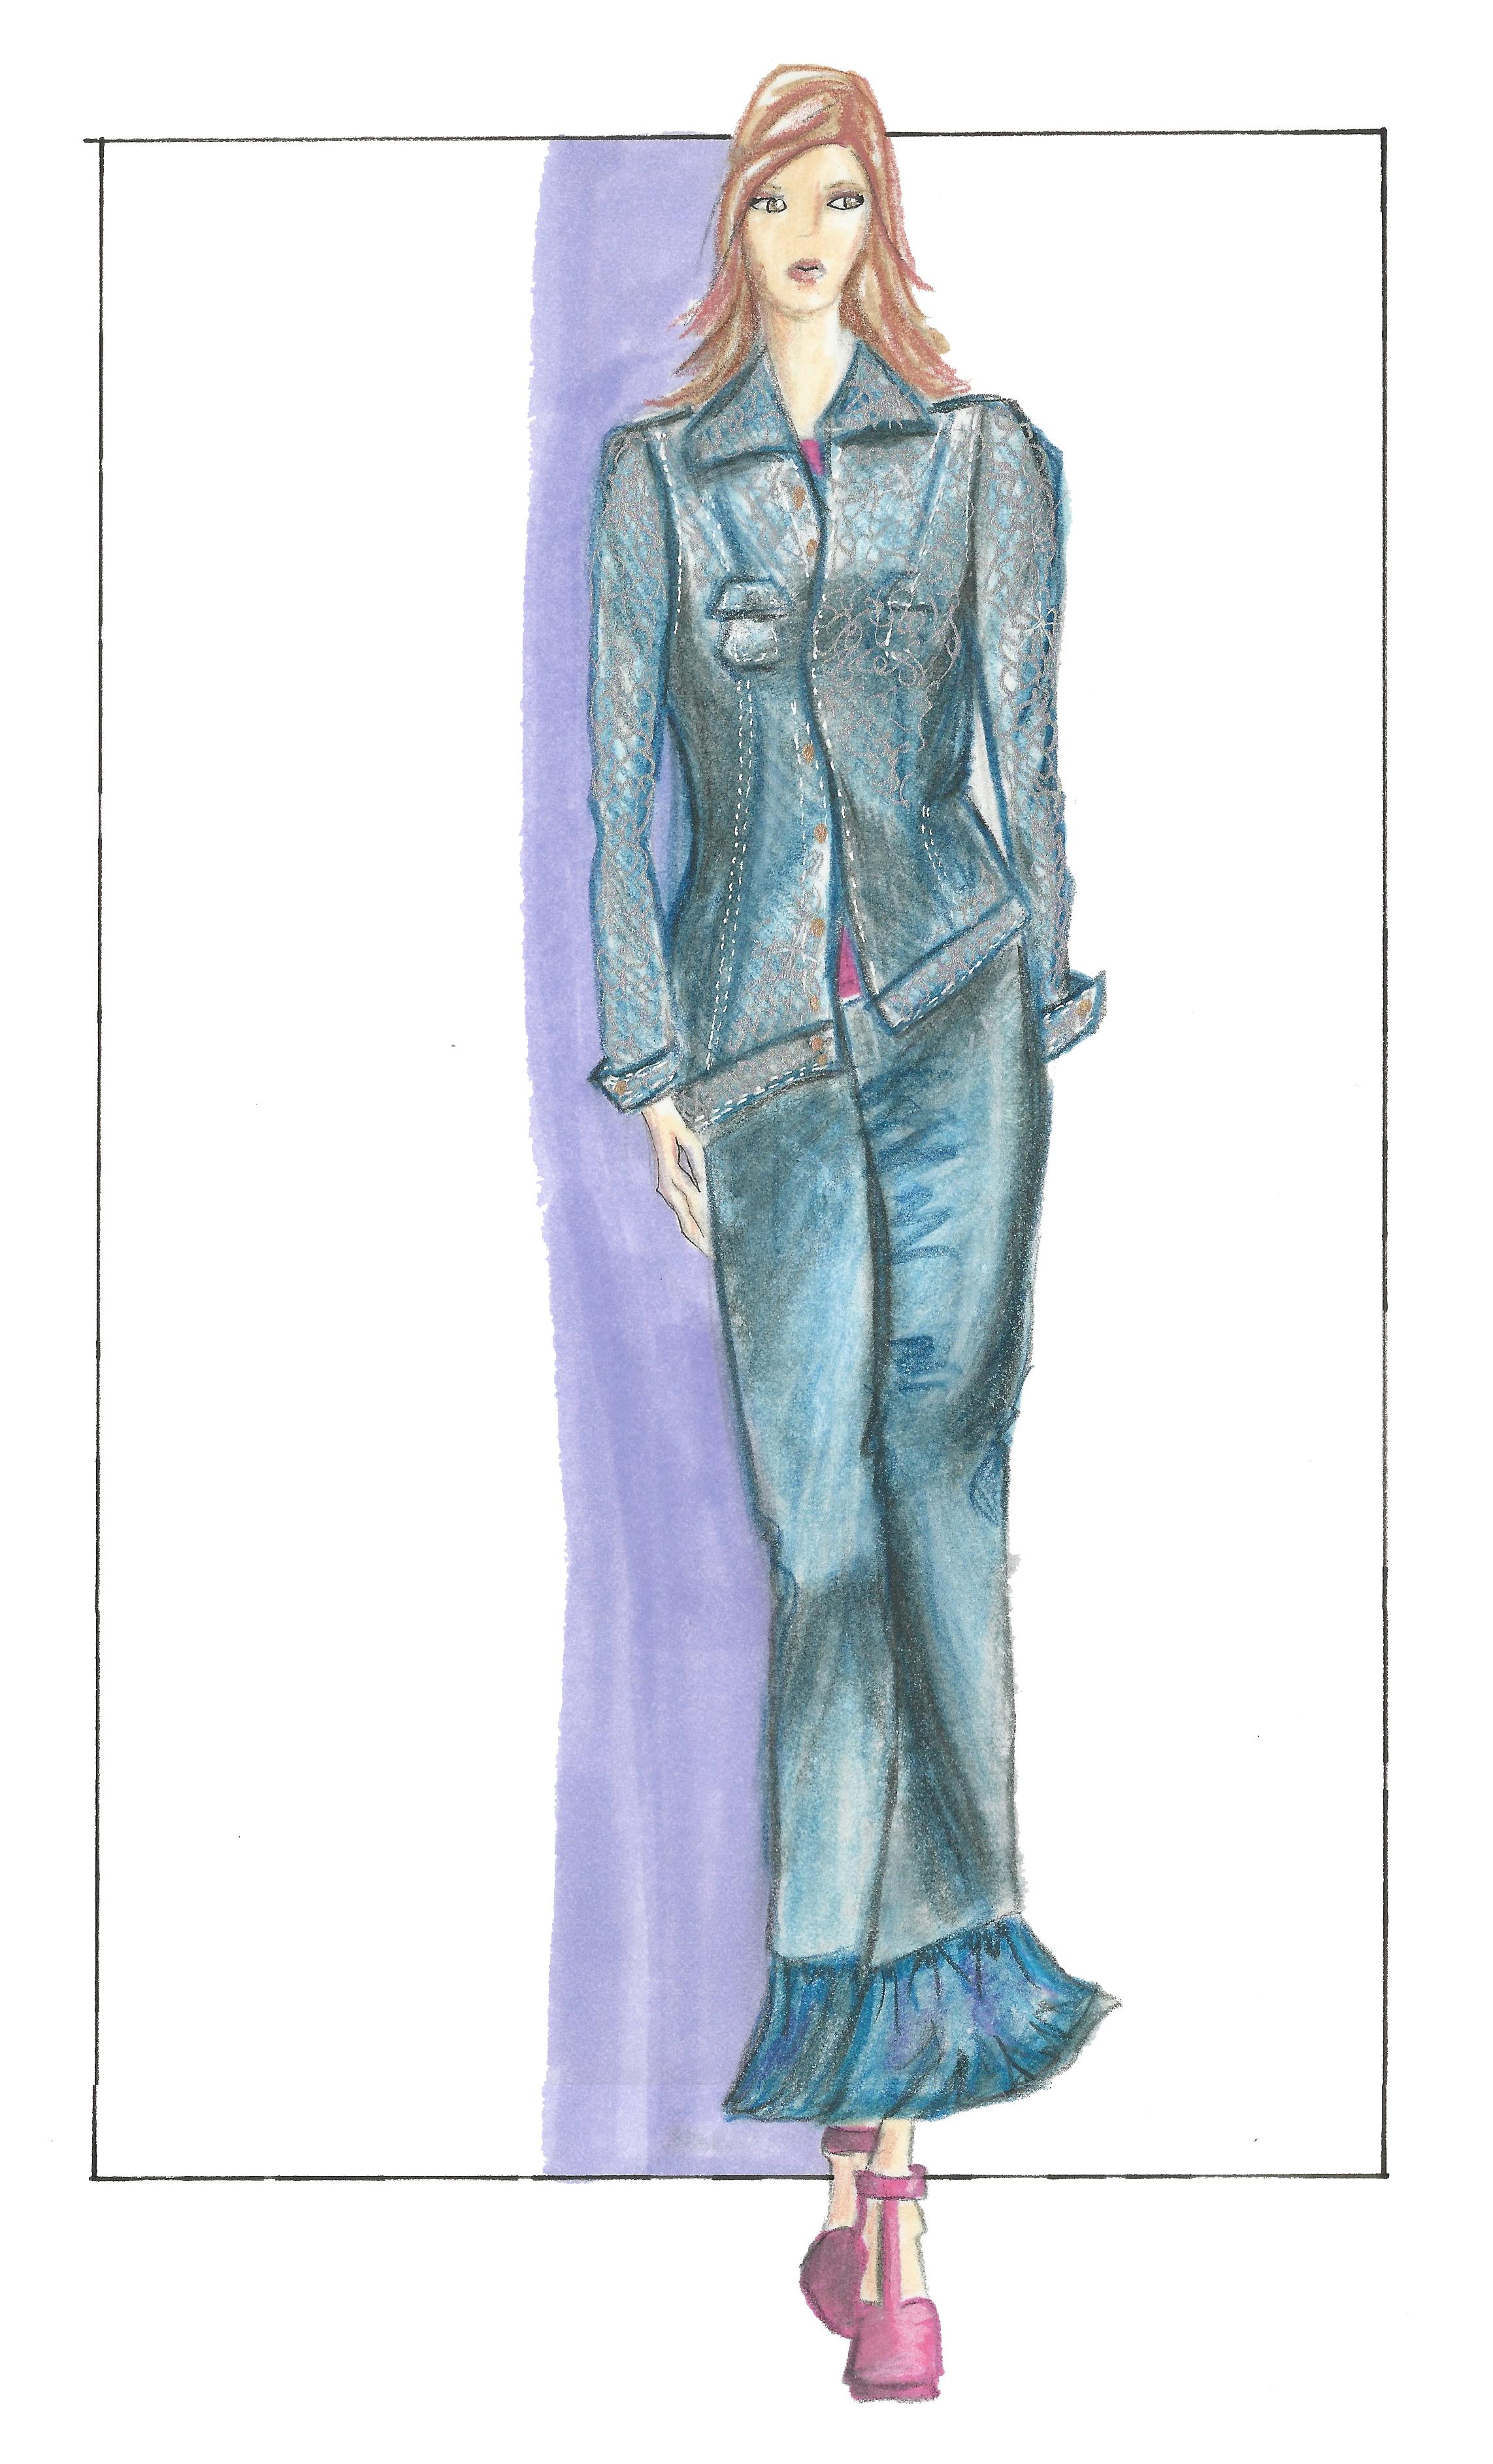 Jean Jacket Sketch